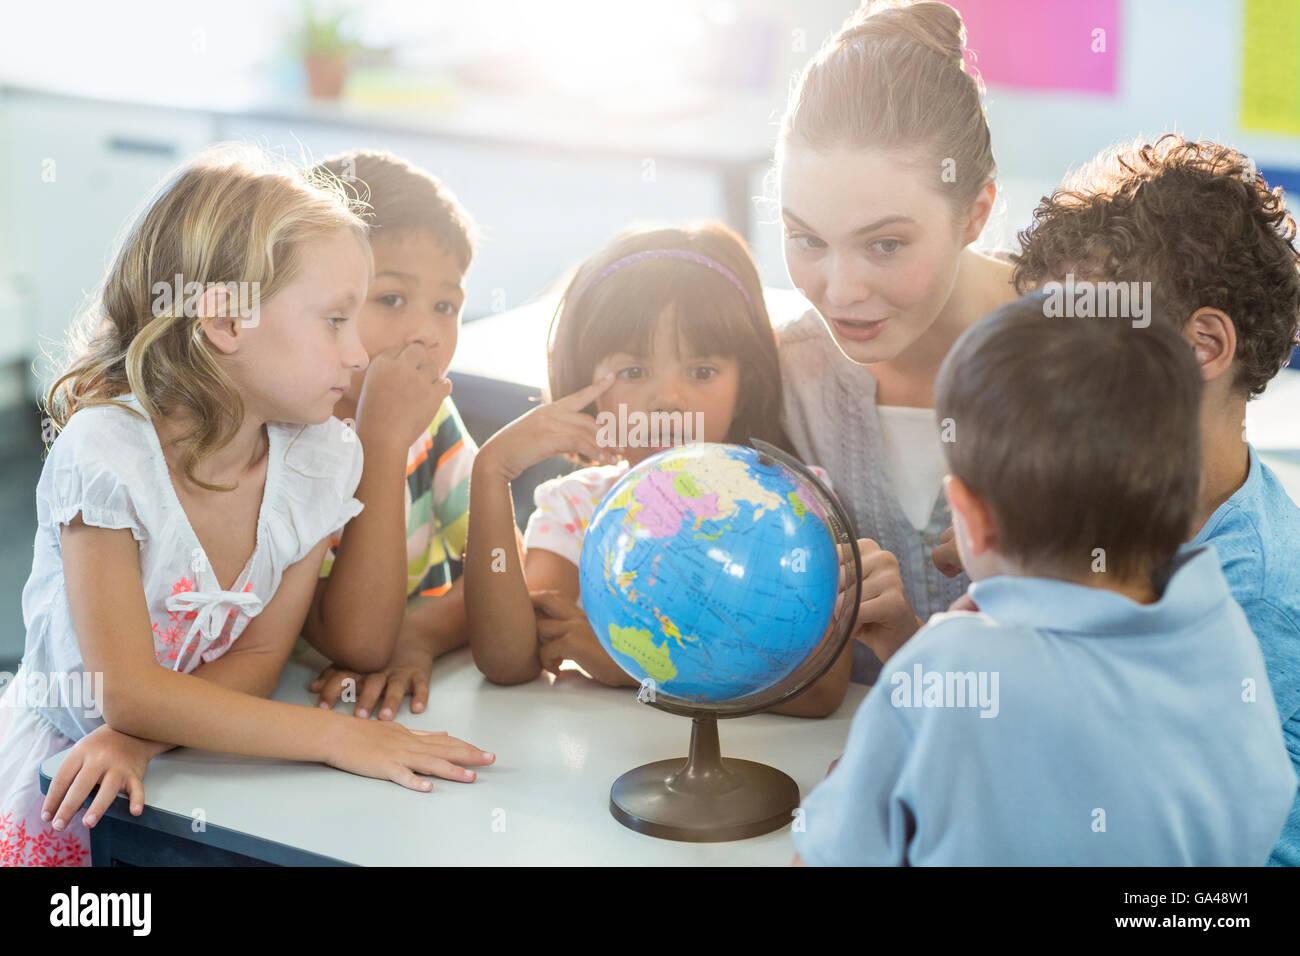 Teacher showing globe to schoolchildren - Stock Image